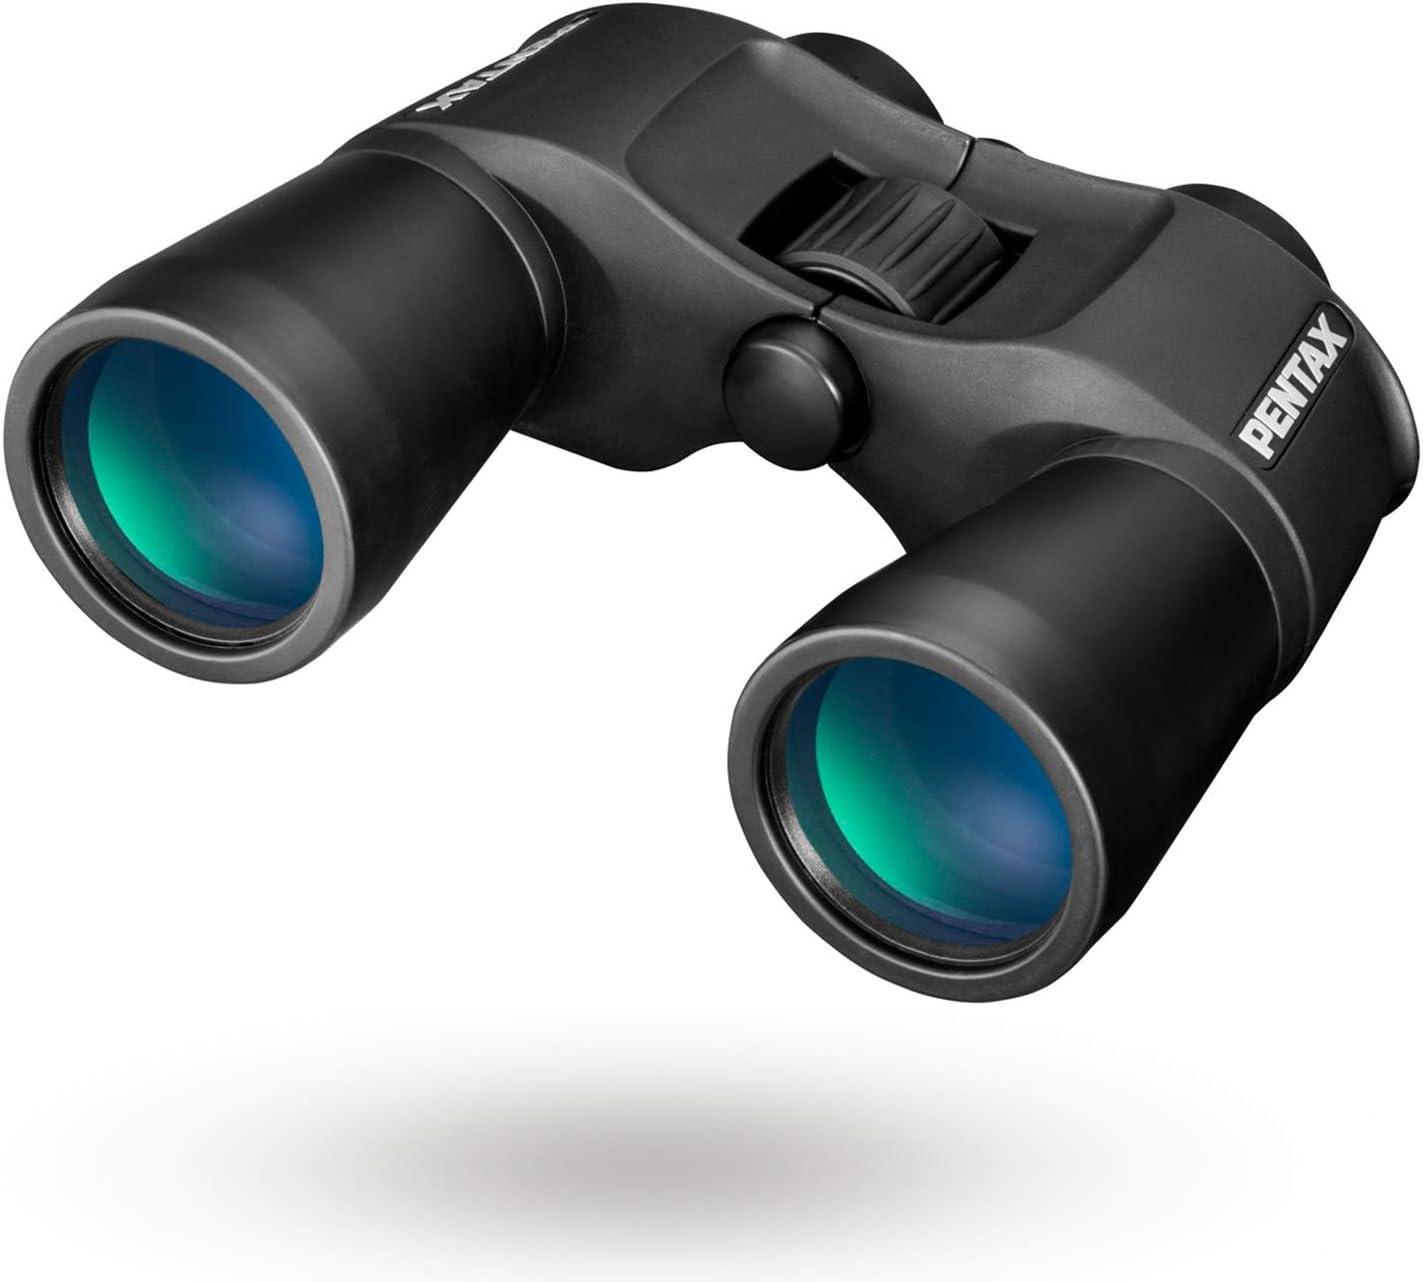 Pentax Sp 12x50 Fernglas Kamera